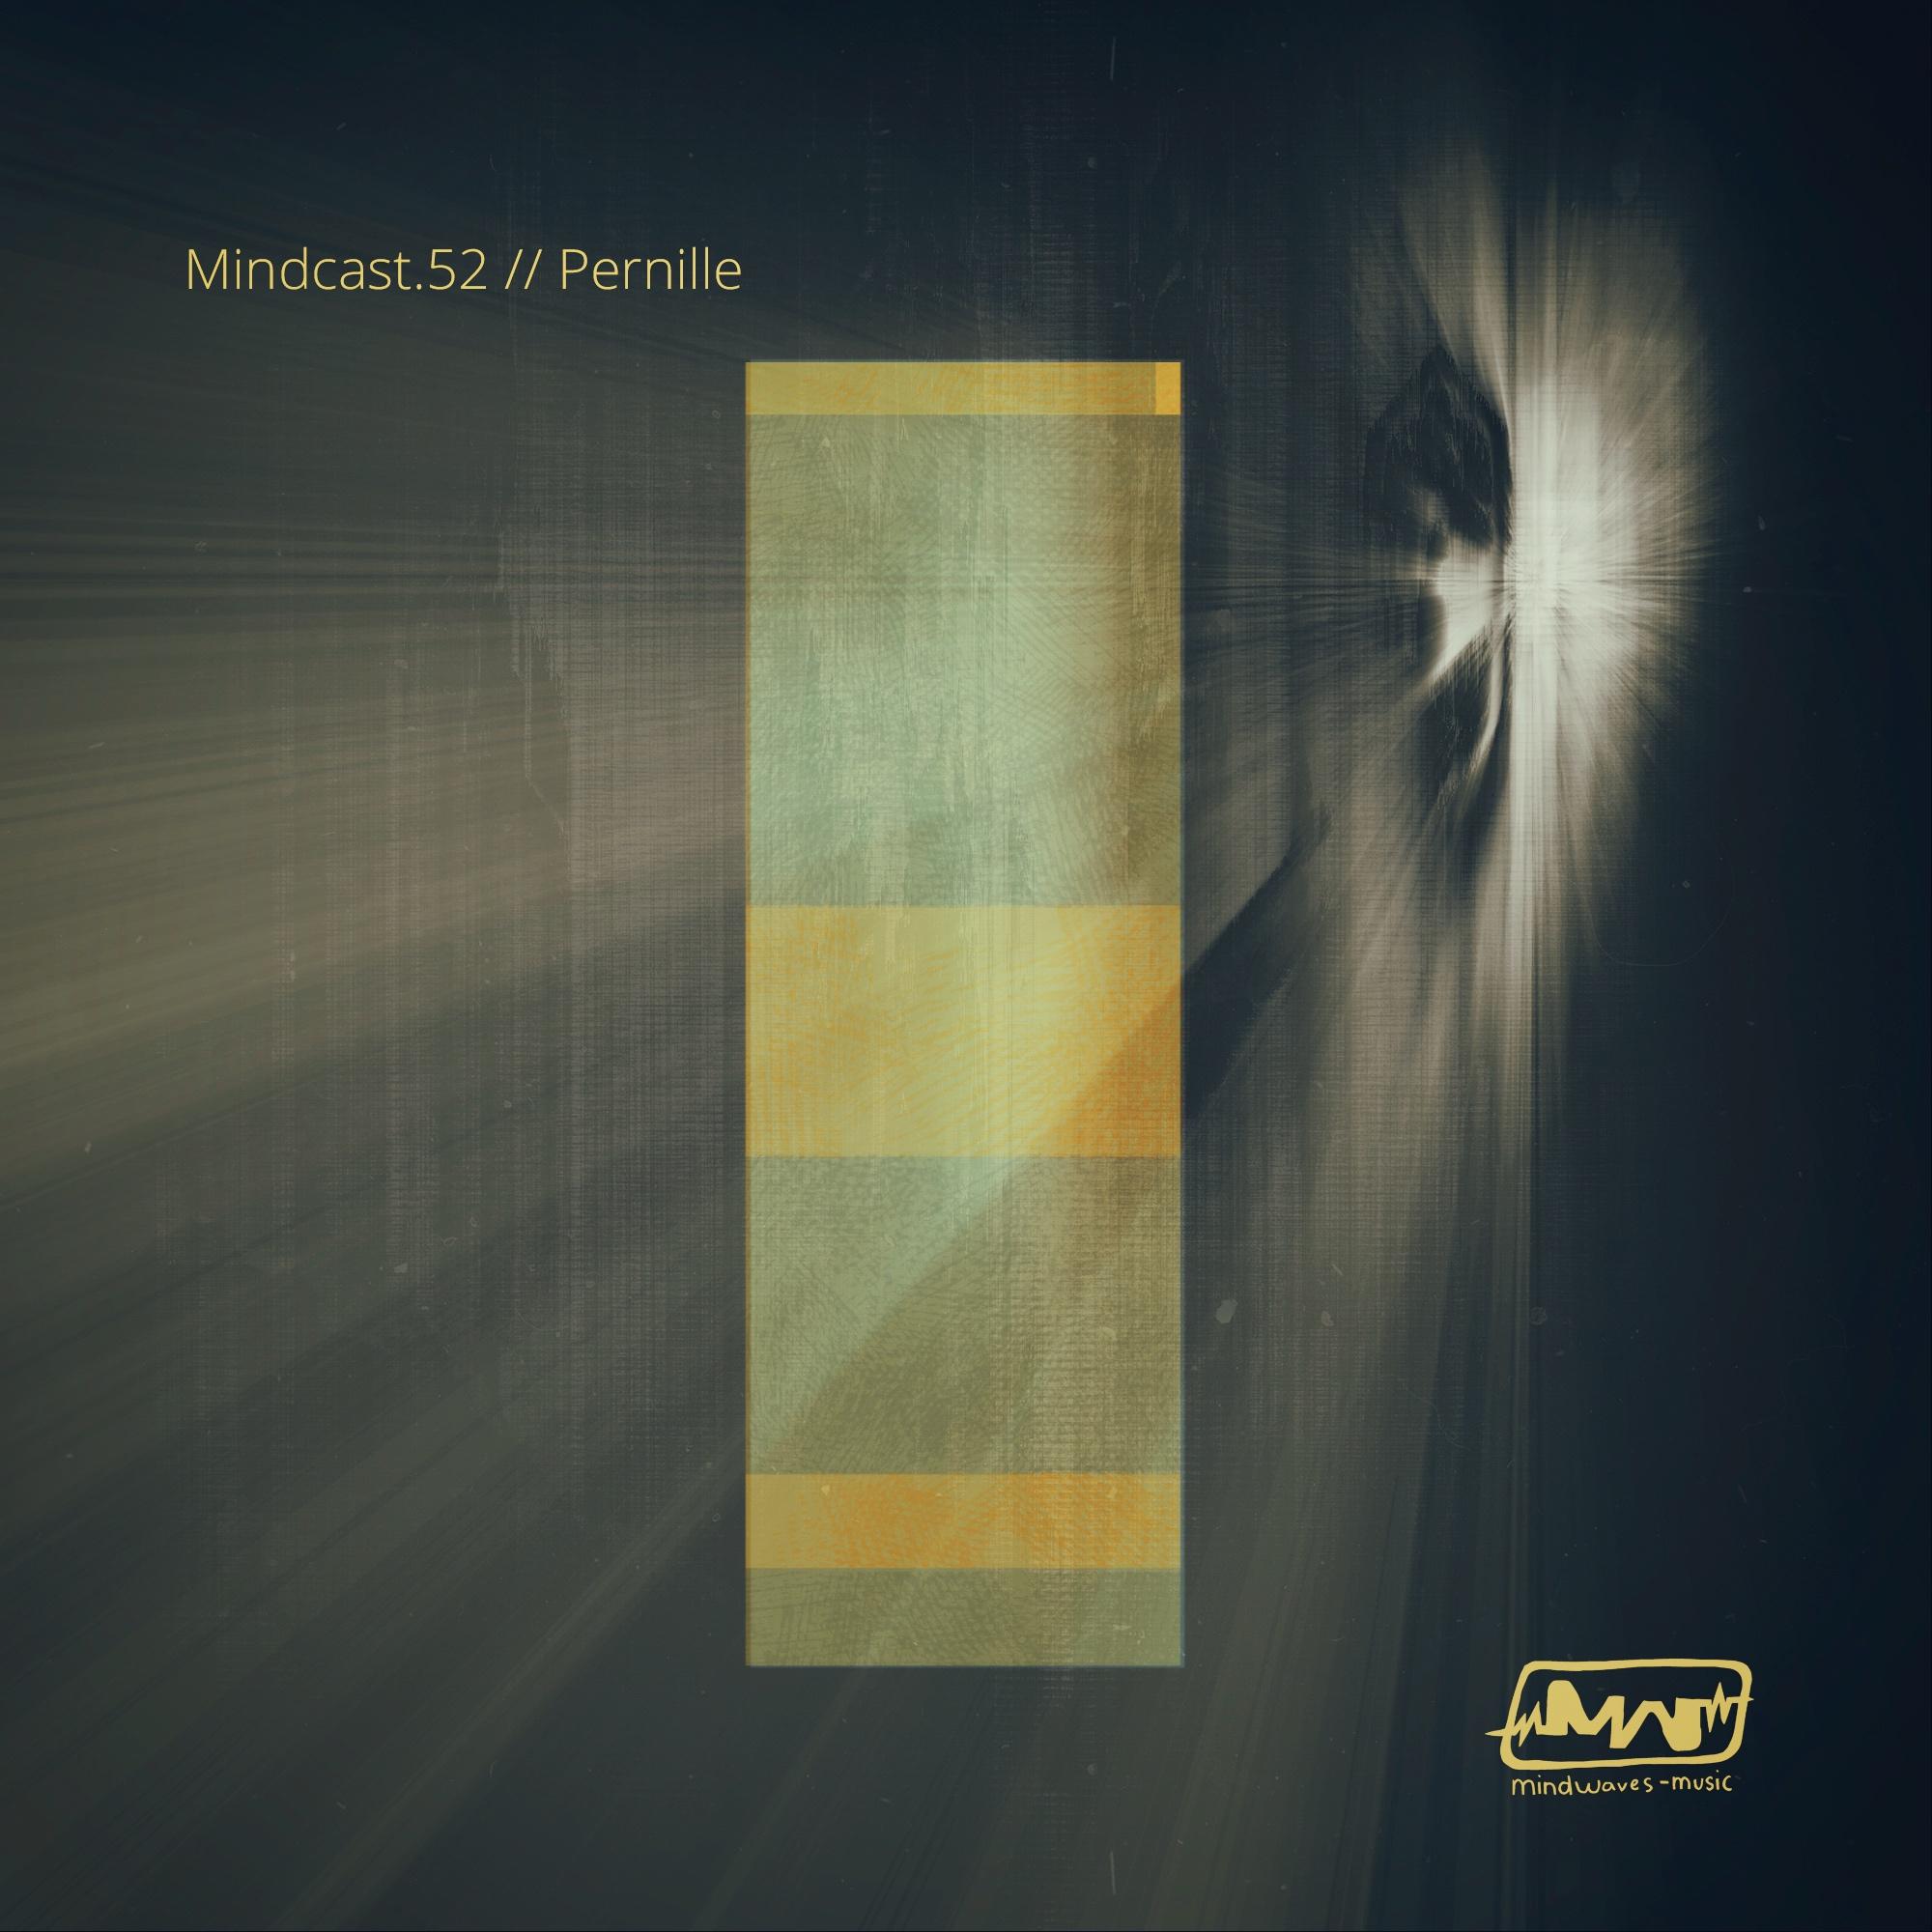 Mindcast.52 // Pernille